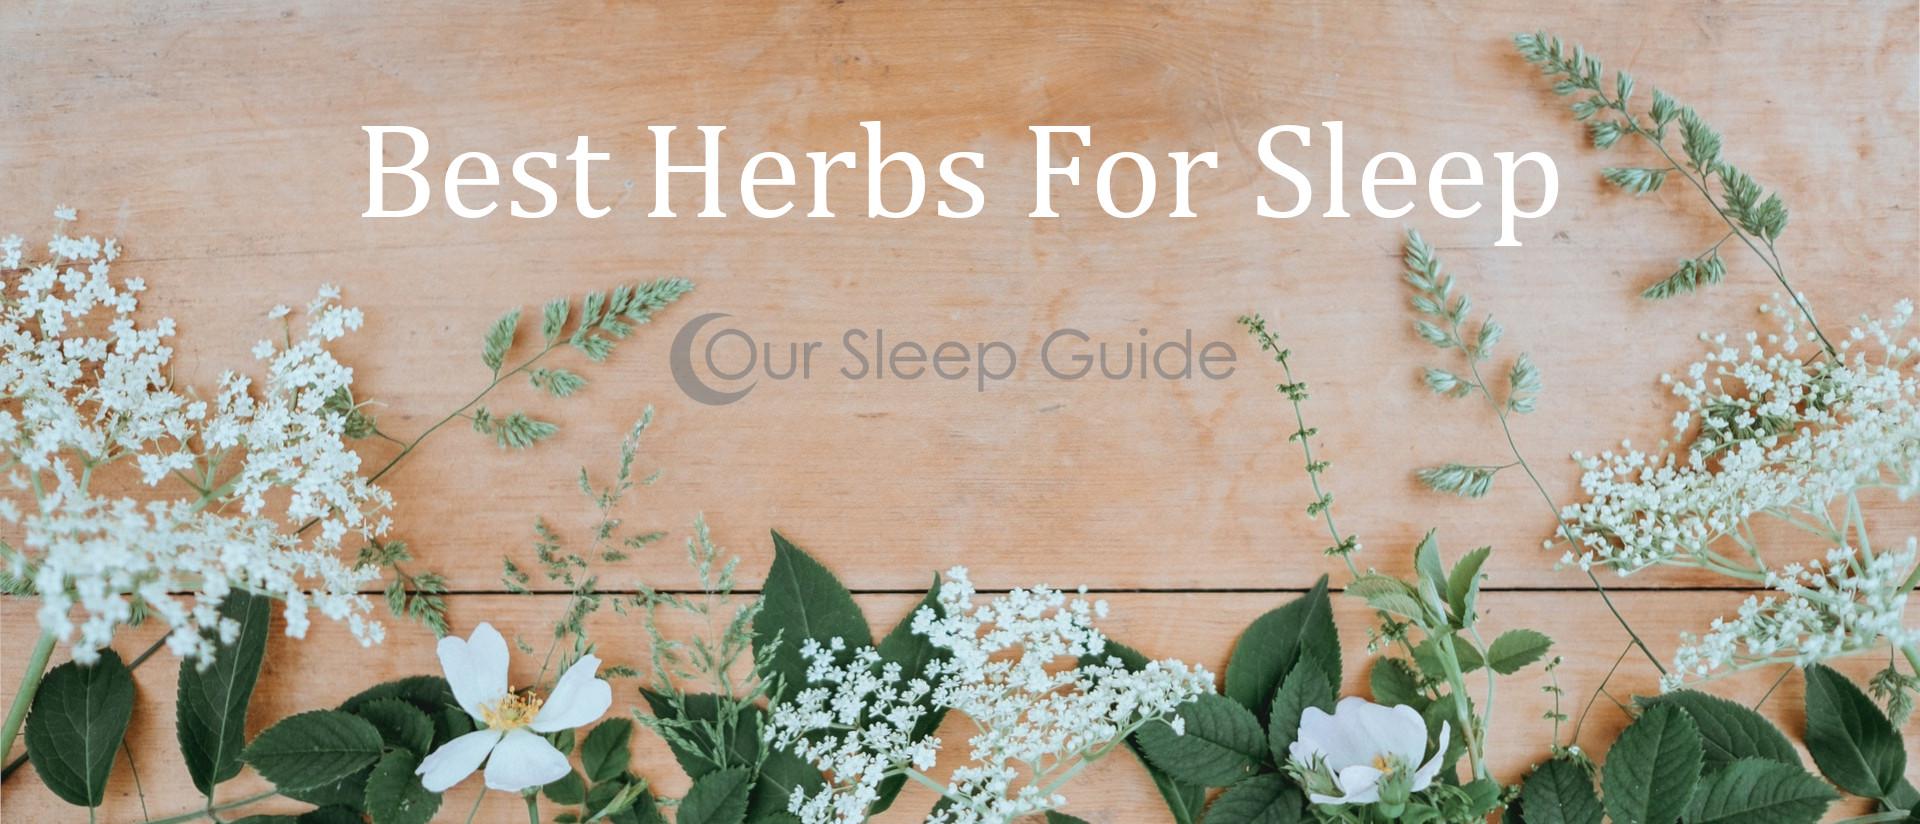 top herbs for sleep